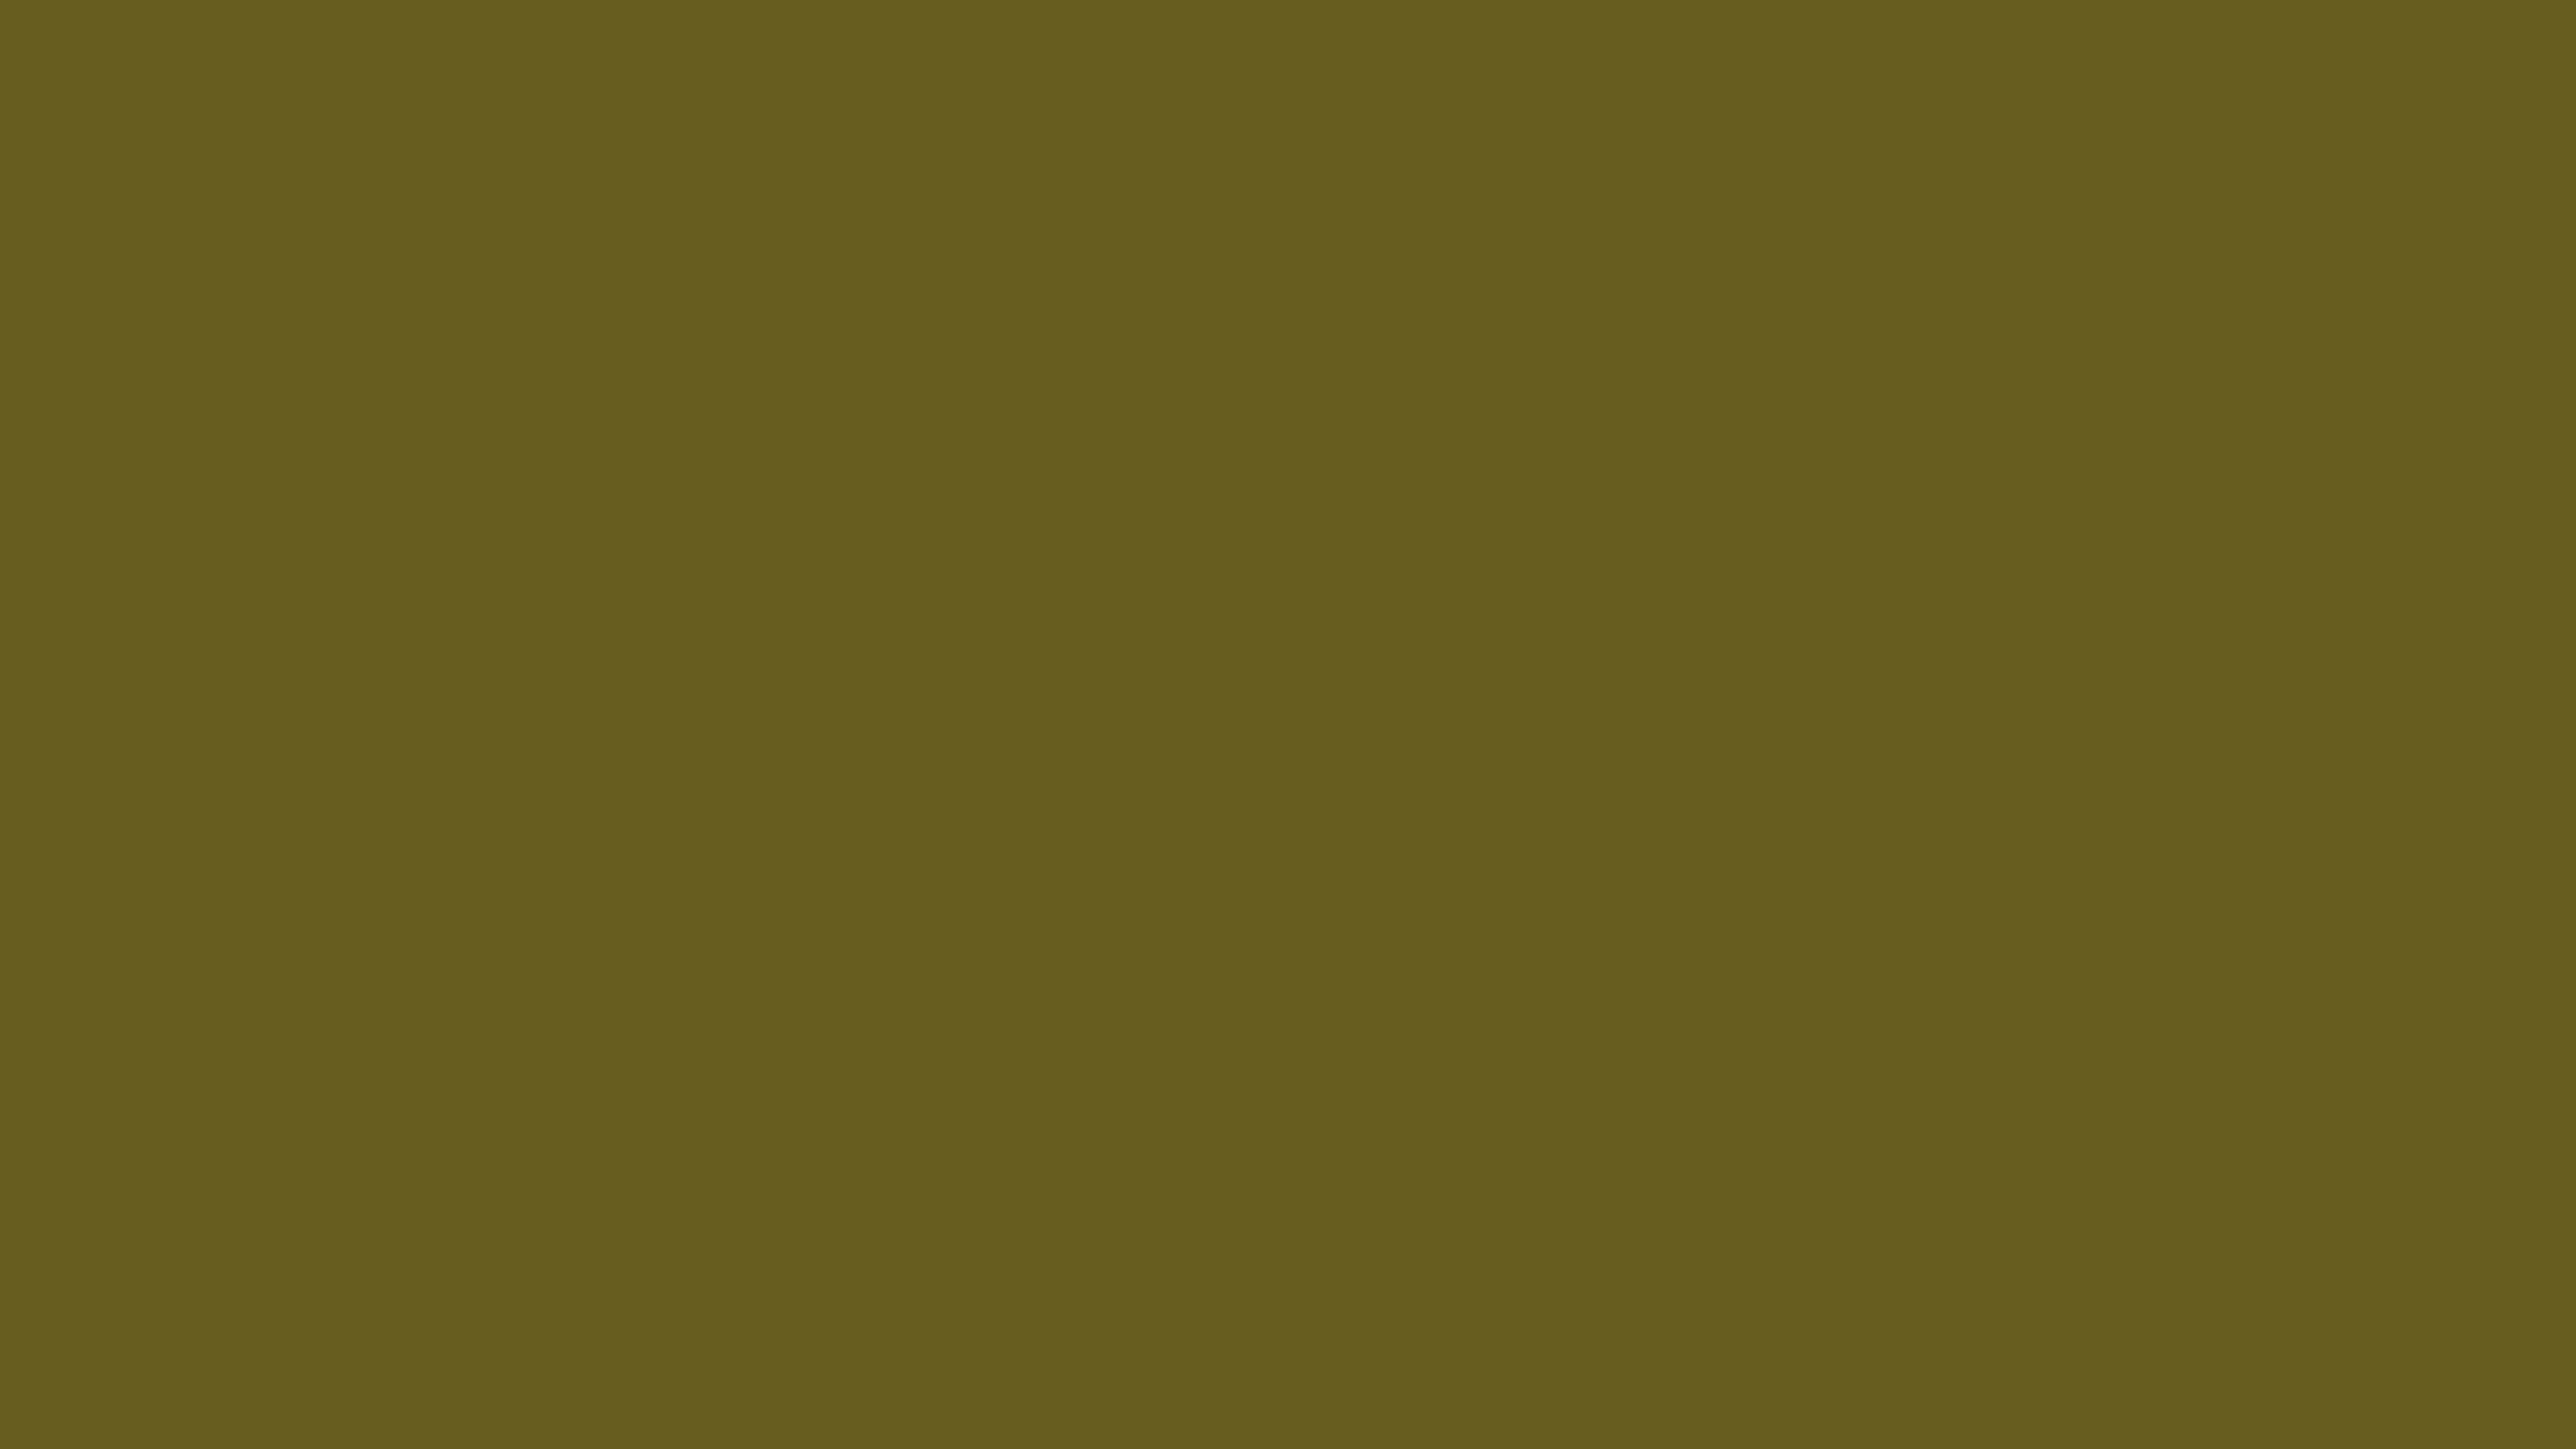 5120x2880 Antique Bronze Solid Color Background